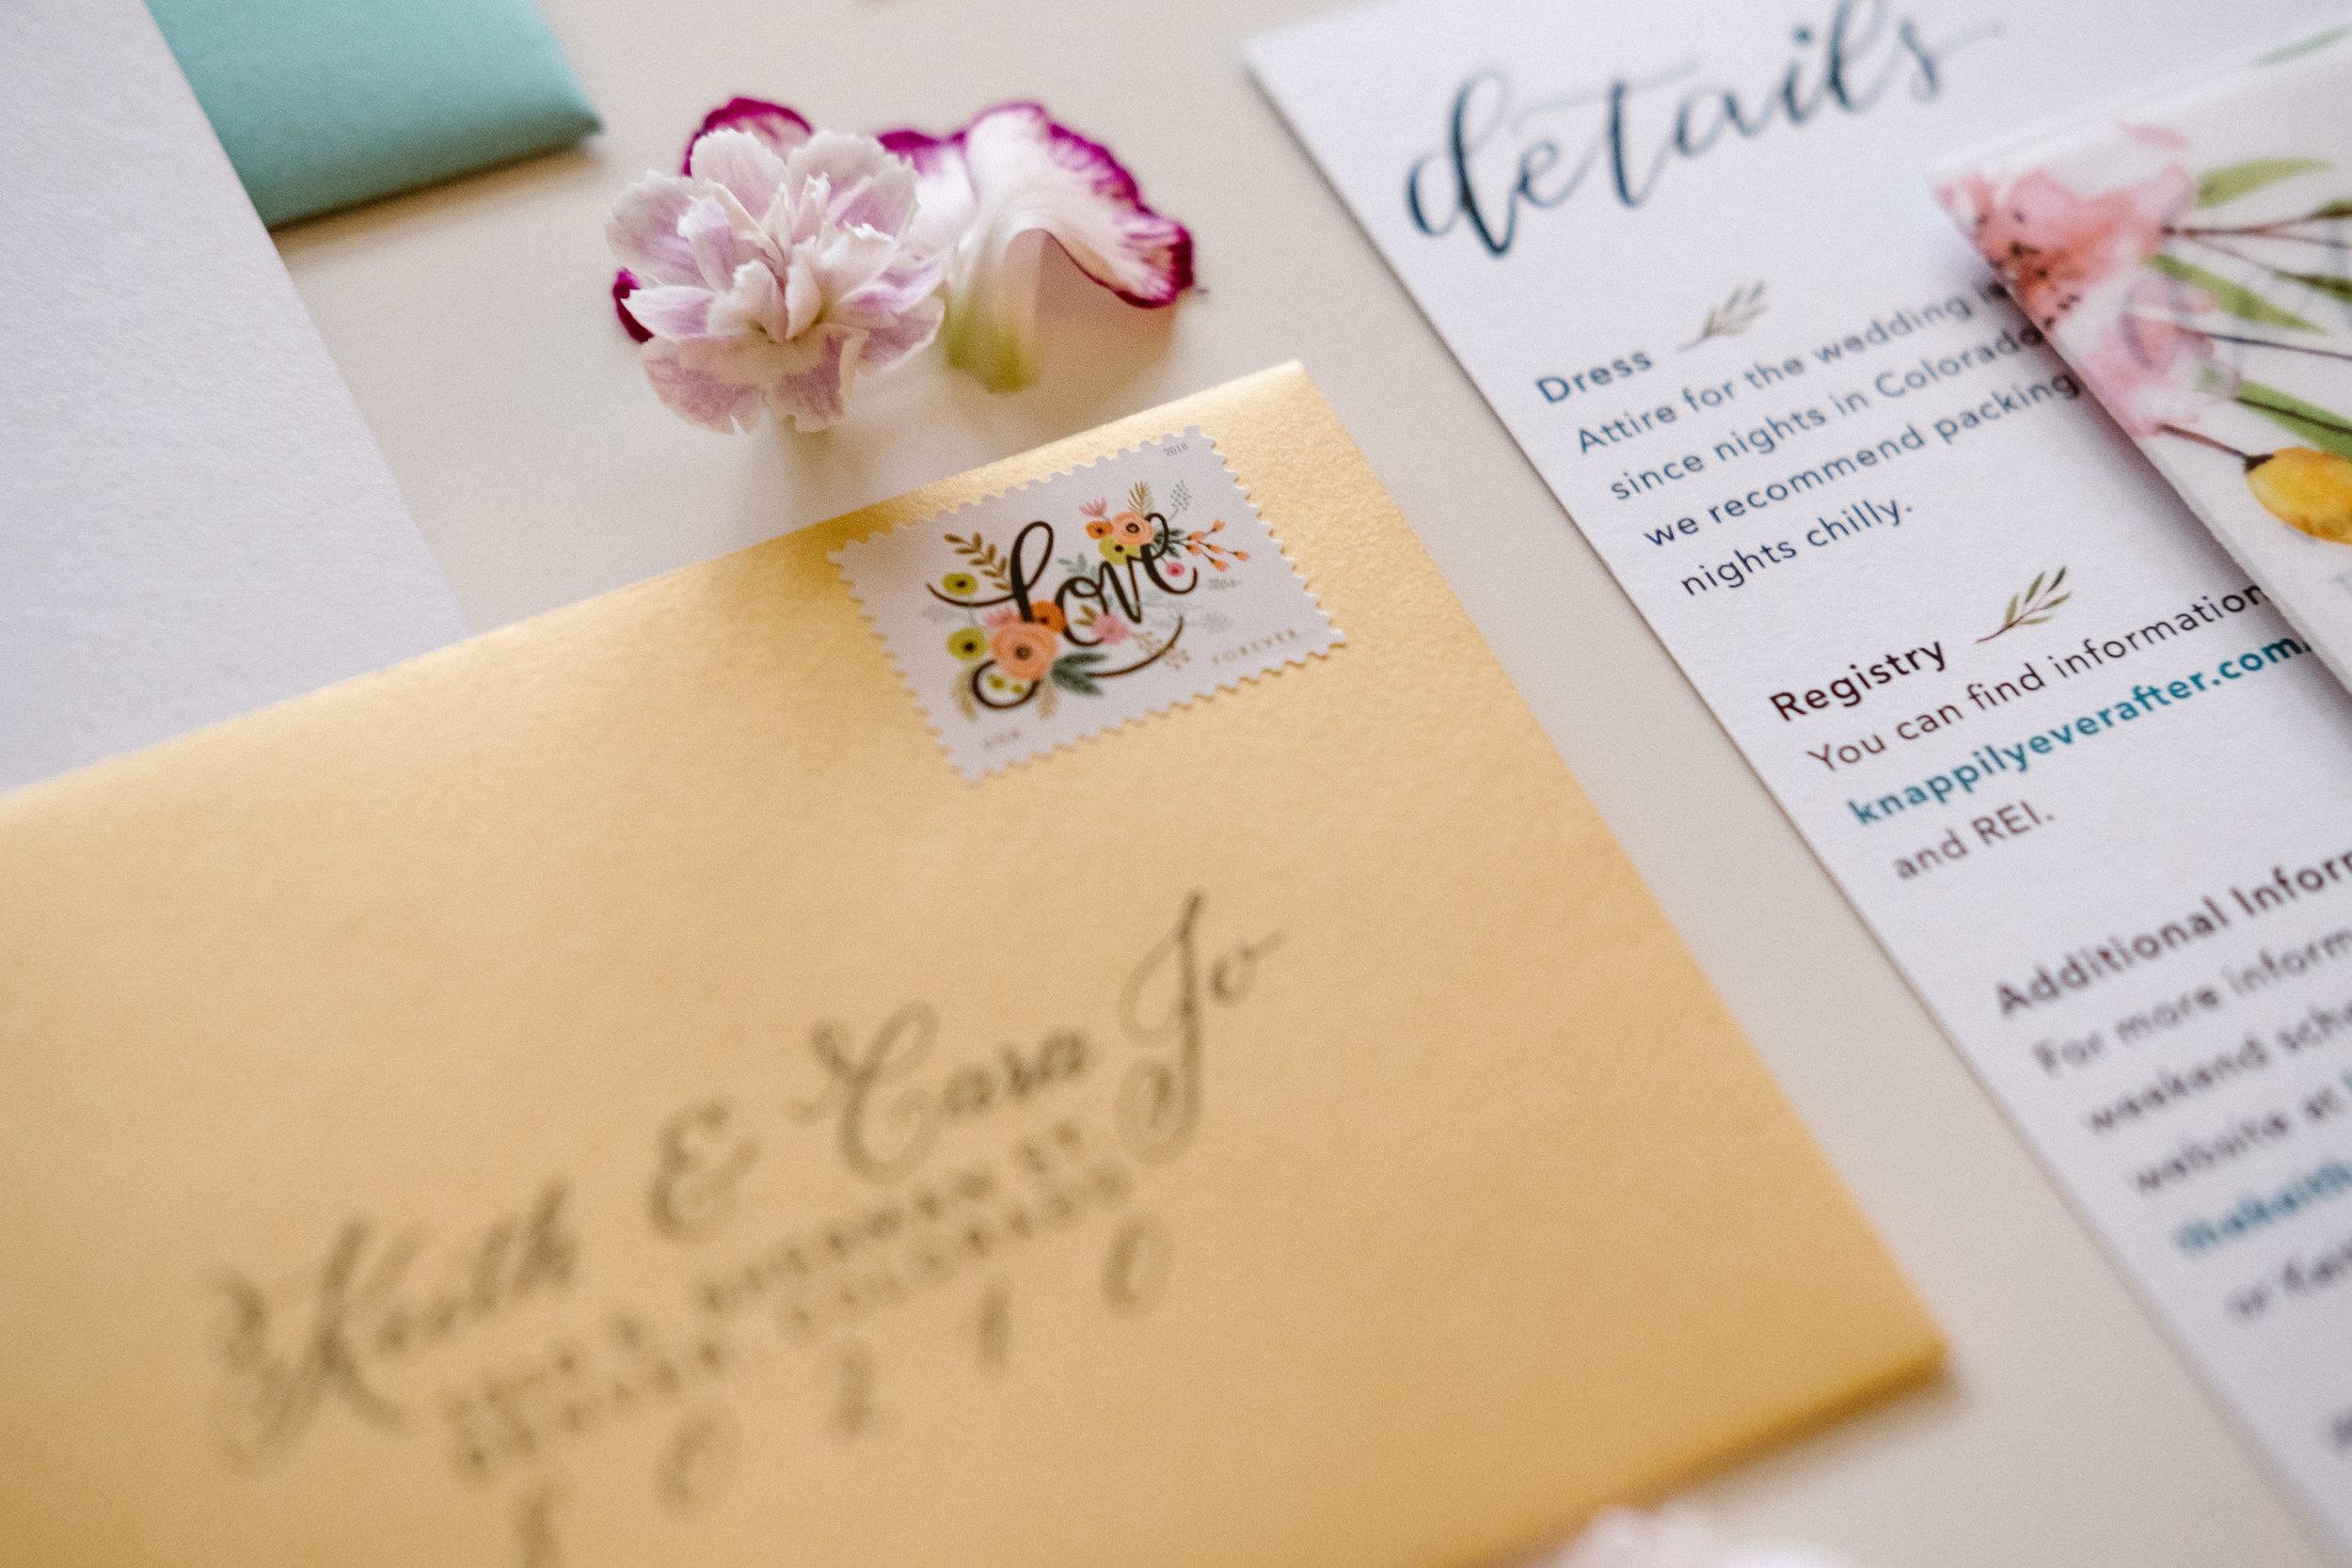 cara-jo-keith-grant-humphreys-mansion-wedding-7-88.jpg